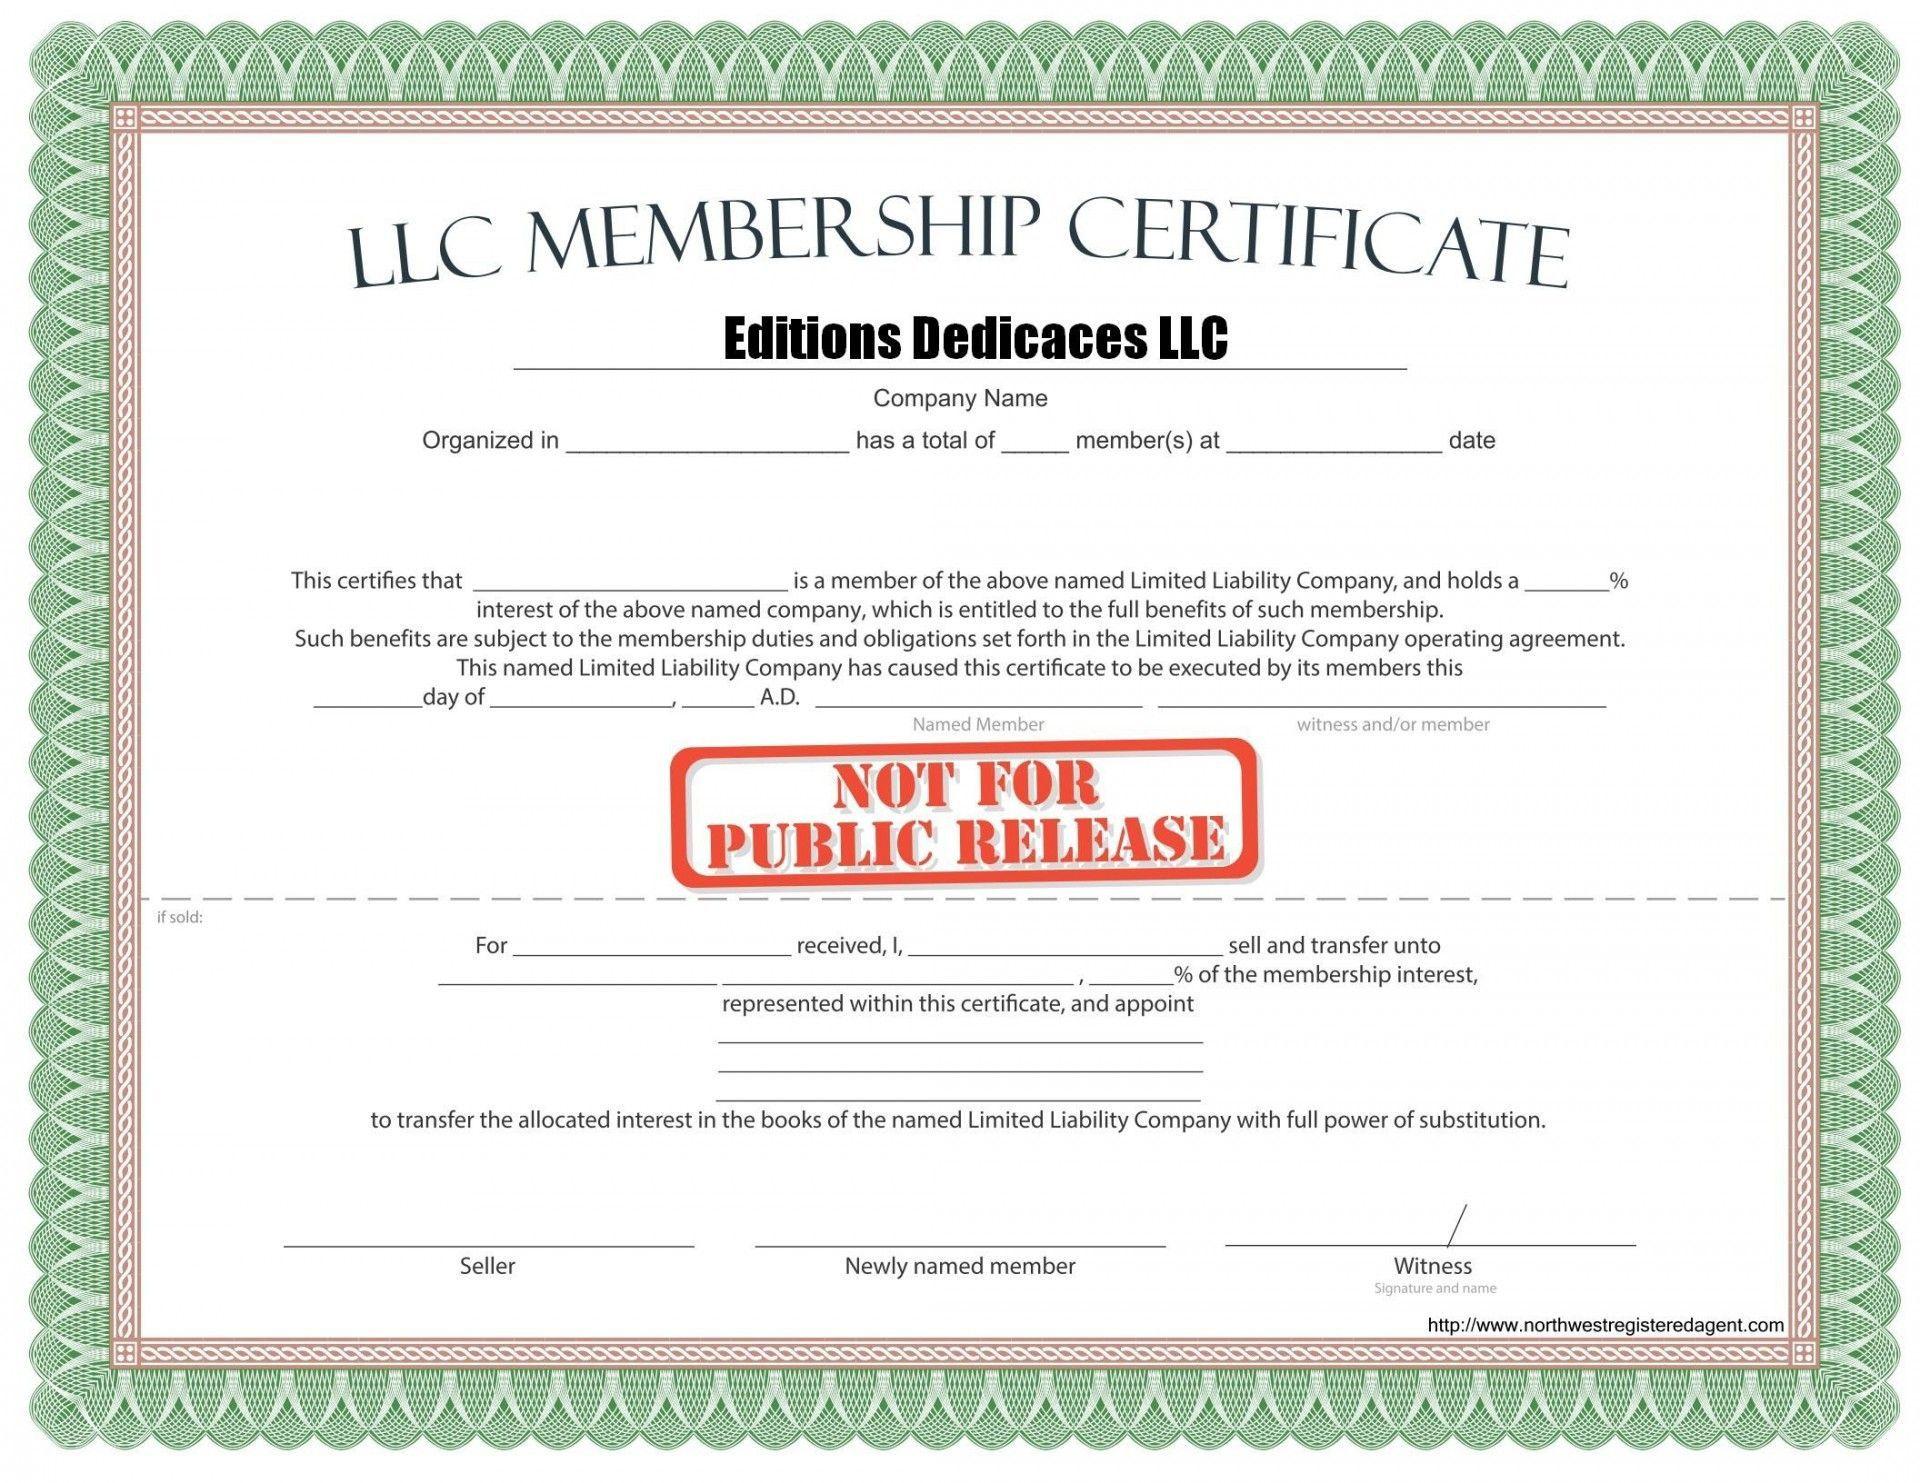 000 Phenomenal Llc Membership Certificate Template Inspiration  Interest Free MemberFull